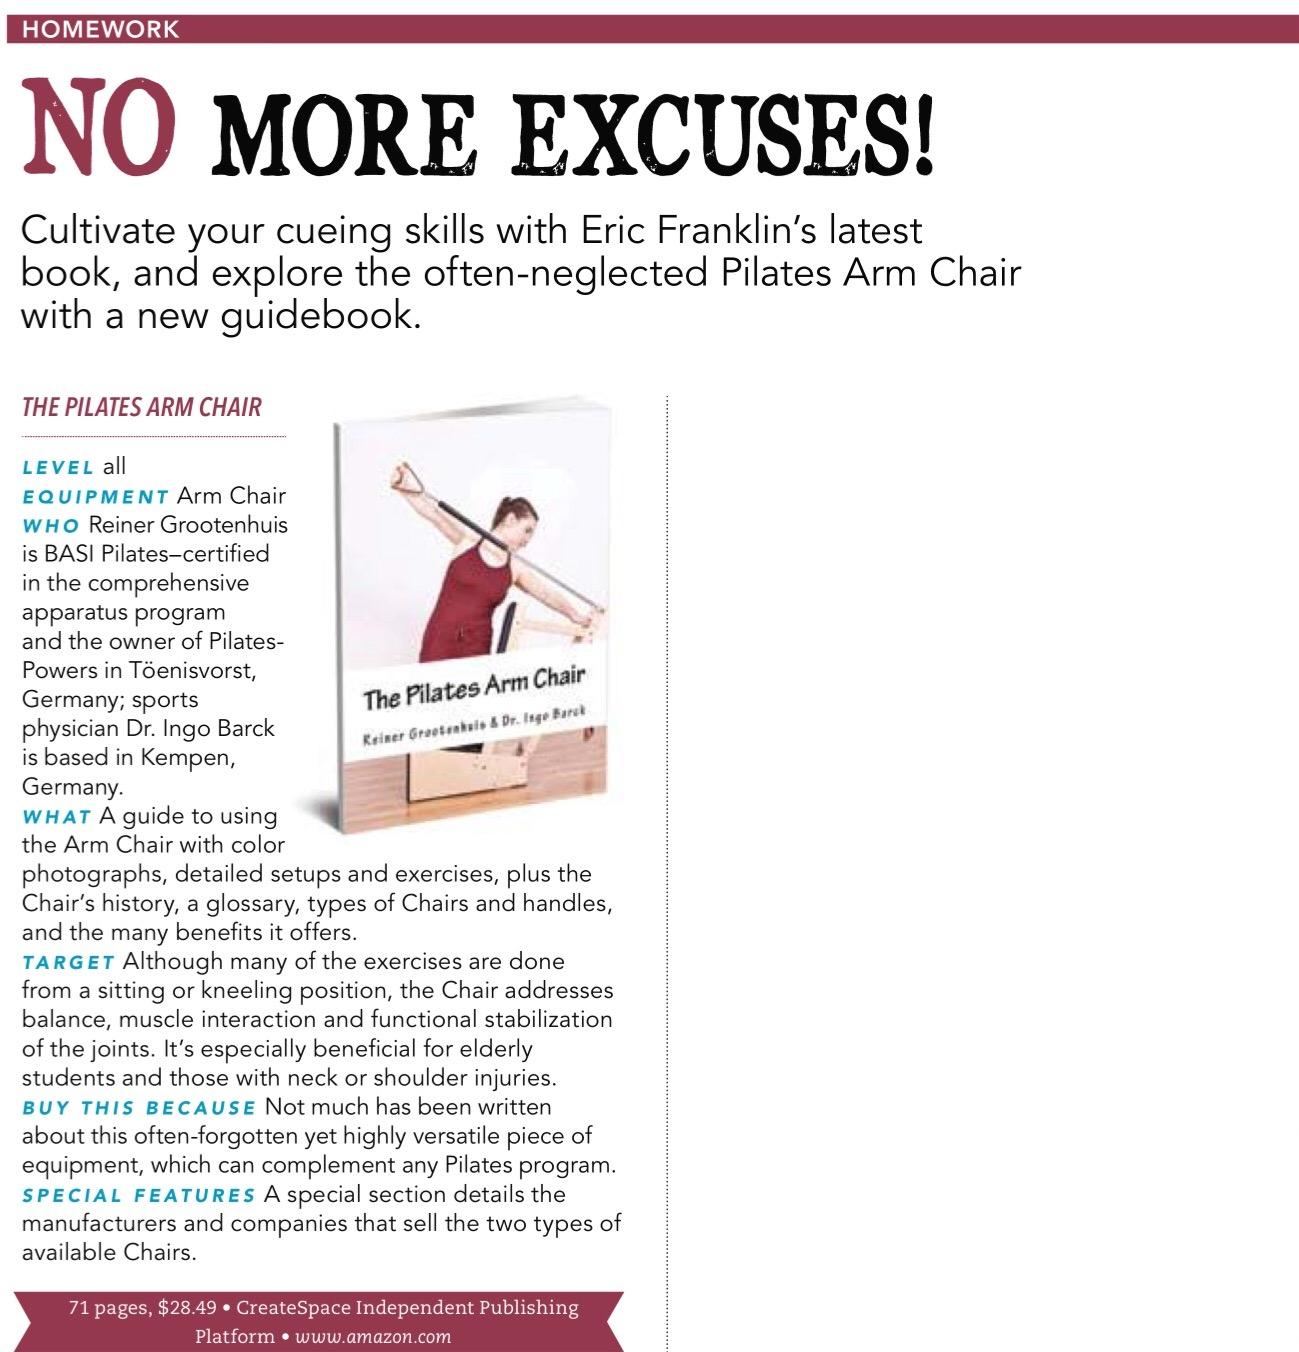 Bericht im Pilates Style Magazine in der Januar/Februar 2017 Ausgabe über Reiner Grootenhuis Pilates Arm Chair Trainingsmanual.